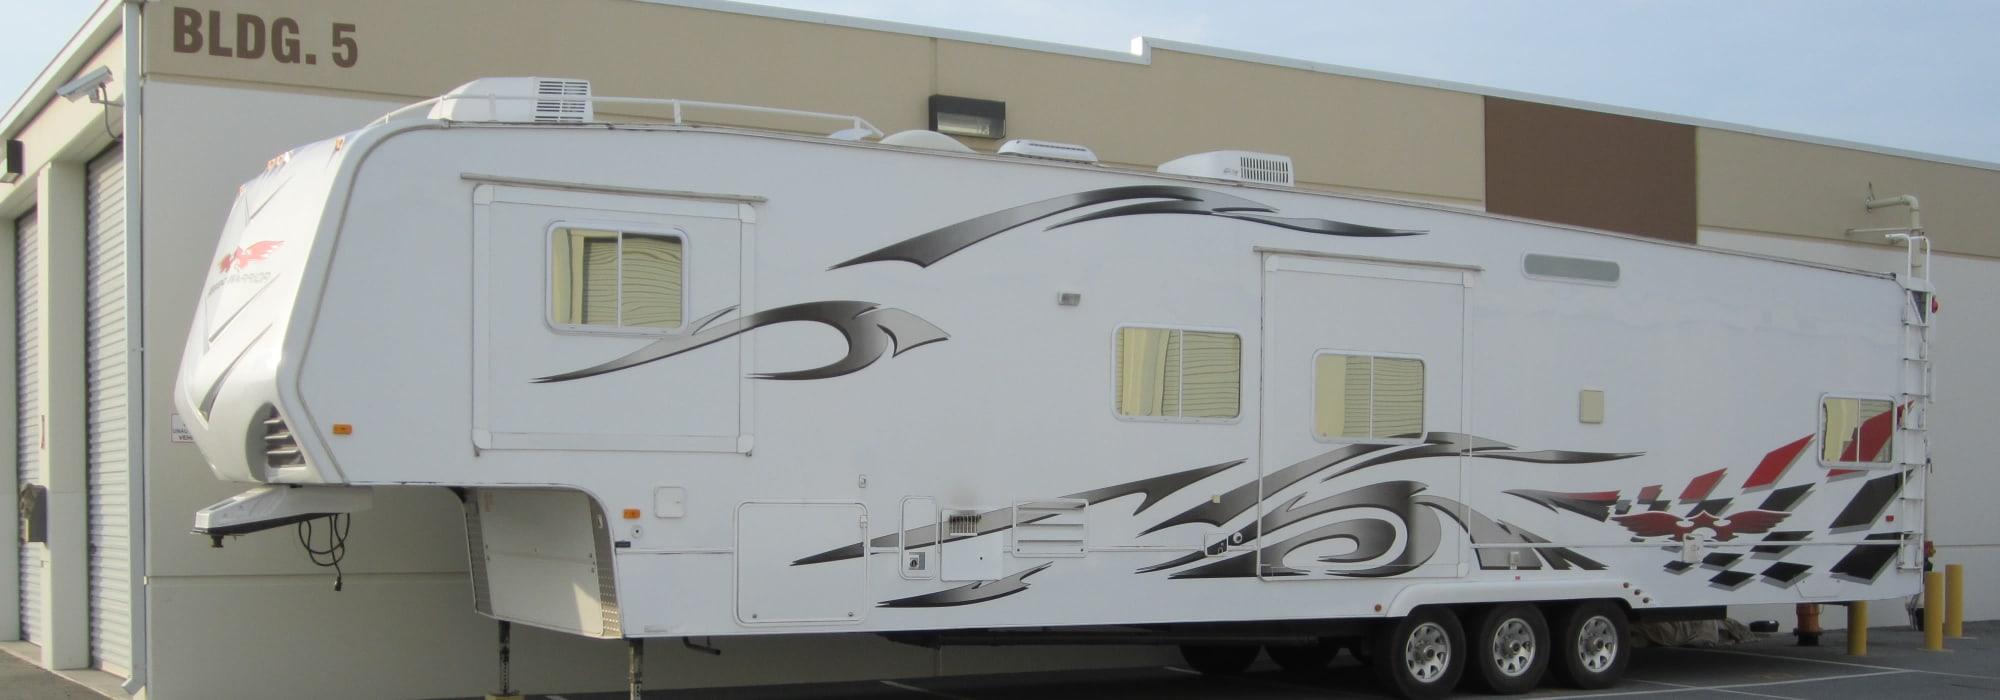 Daytona RV & Boat Storage self storage in Perris, California